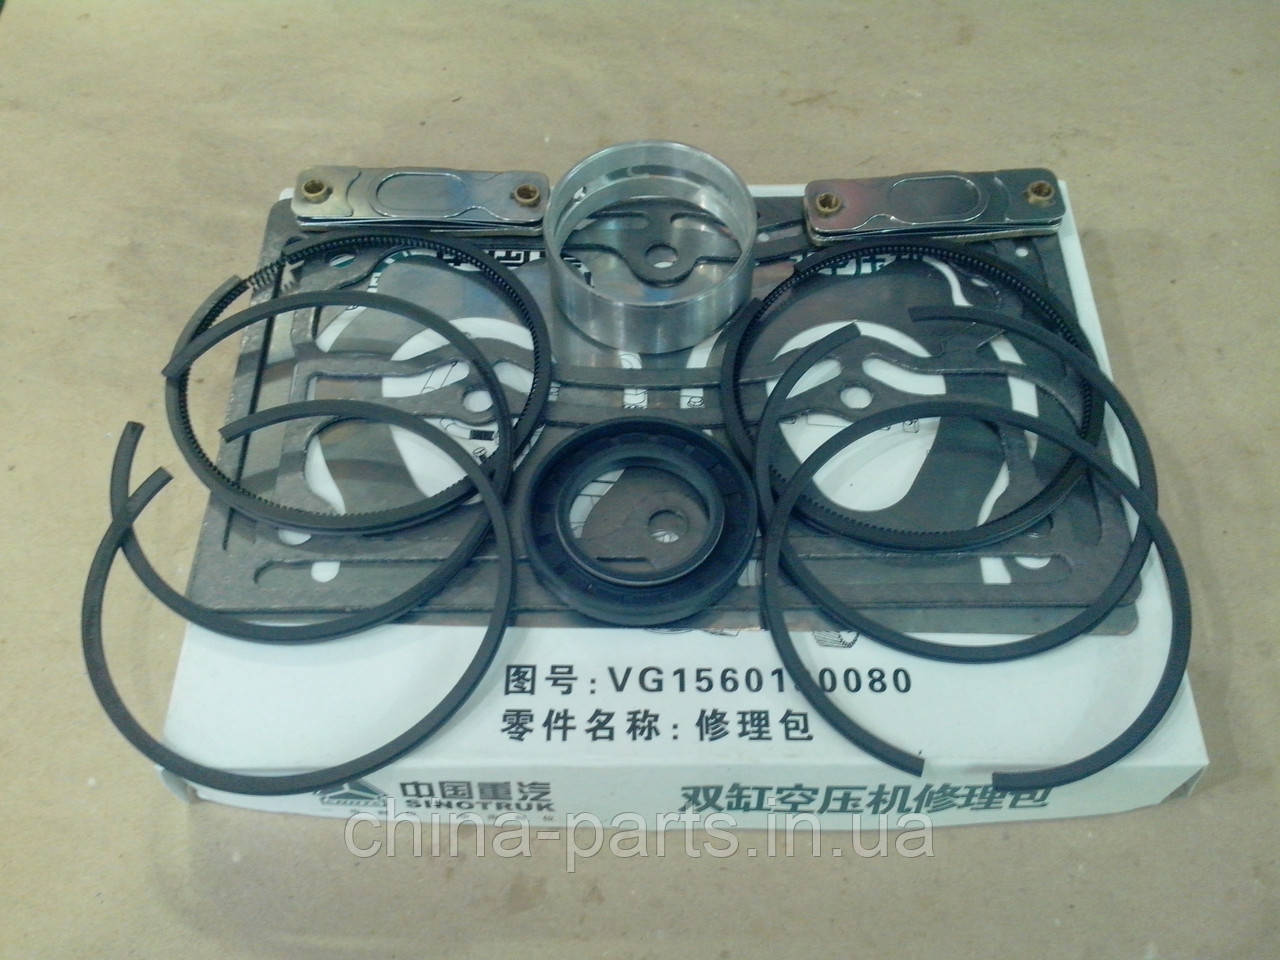 Ремкомплект компрессора (2 рабочих цилиндра) WD615 HOWO   VG1560130080-XLB  #запчасти HOWO